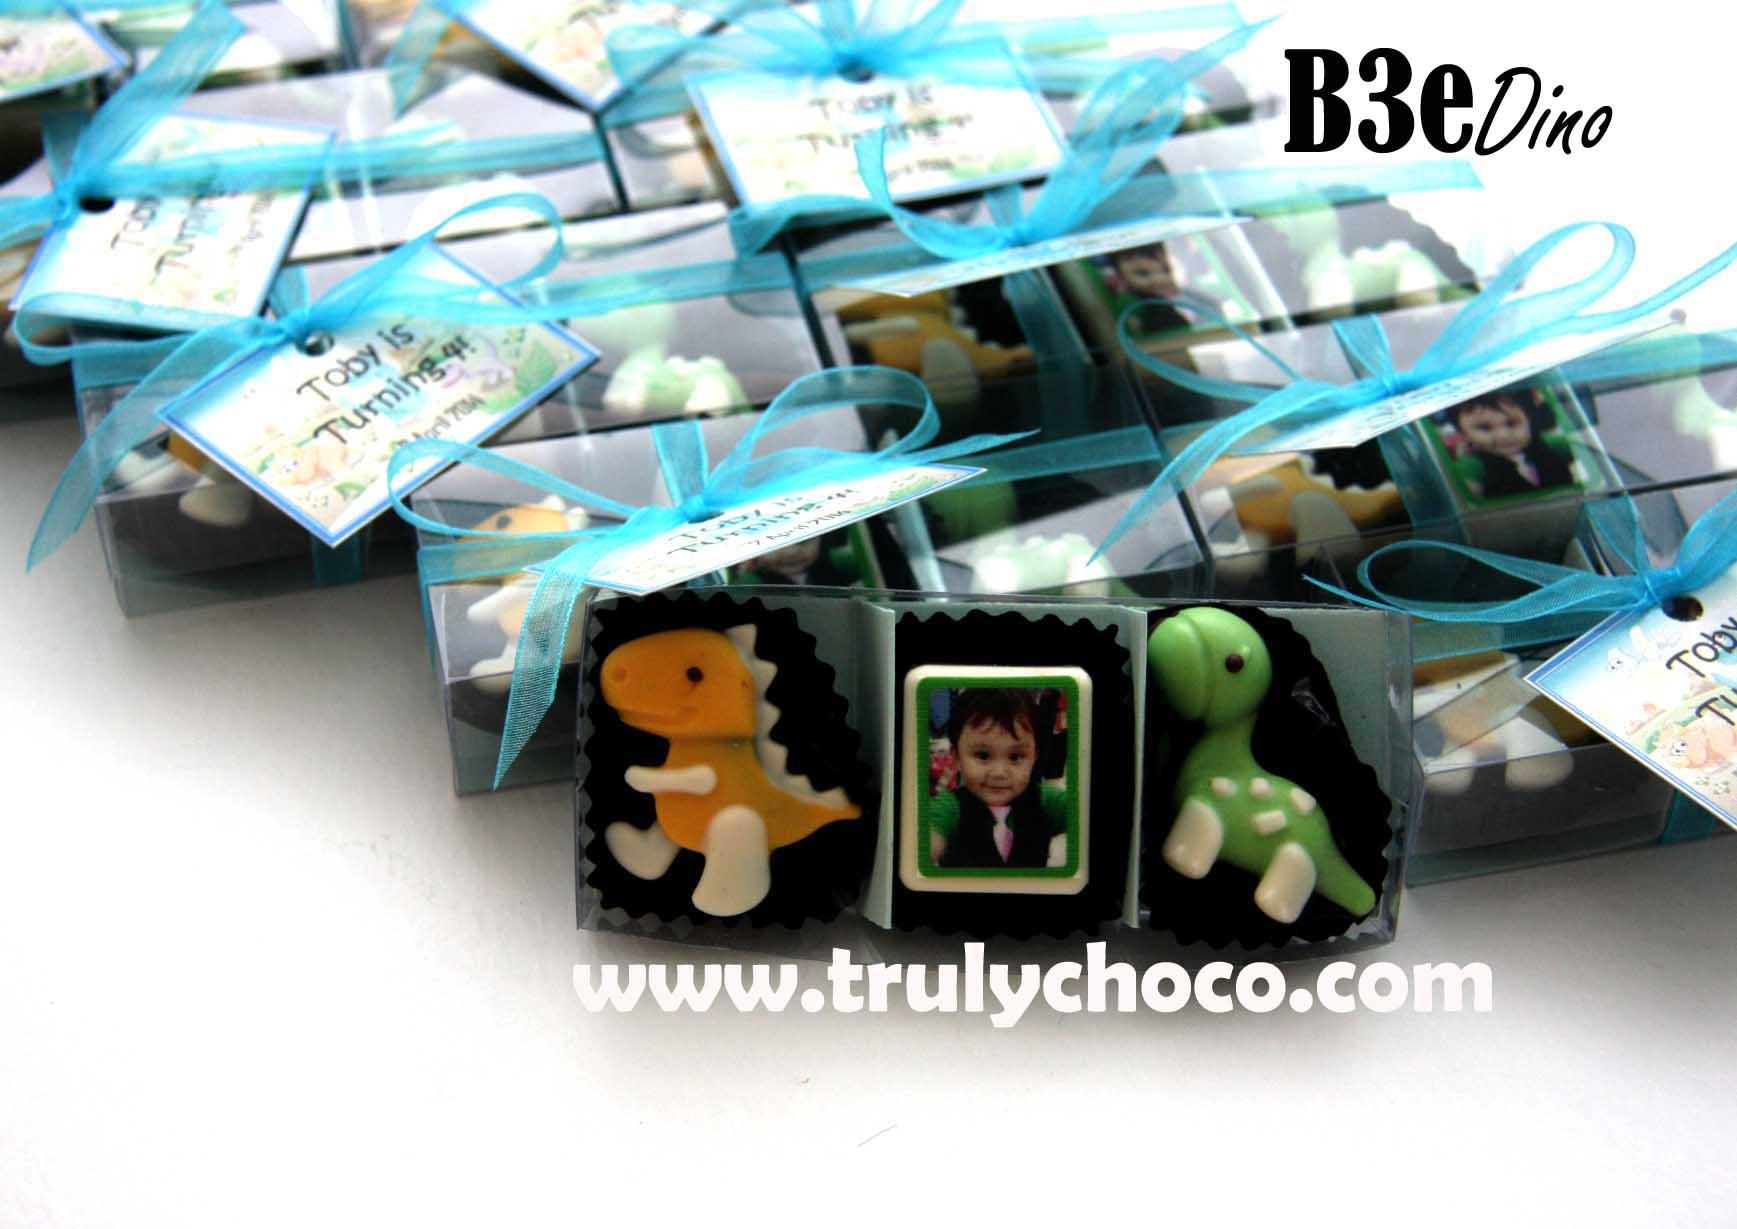 Souvenir ultah anak coklat bentuk dinosaurus dan foto edible anak yang